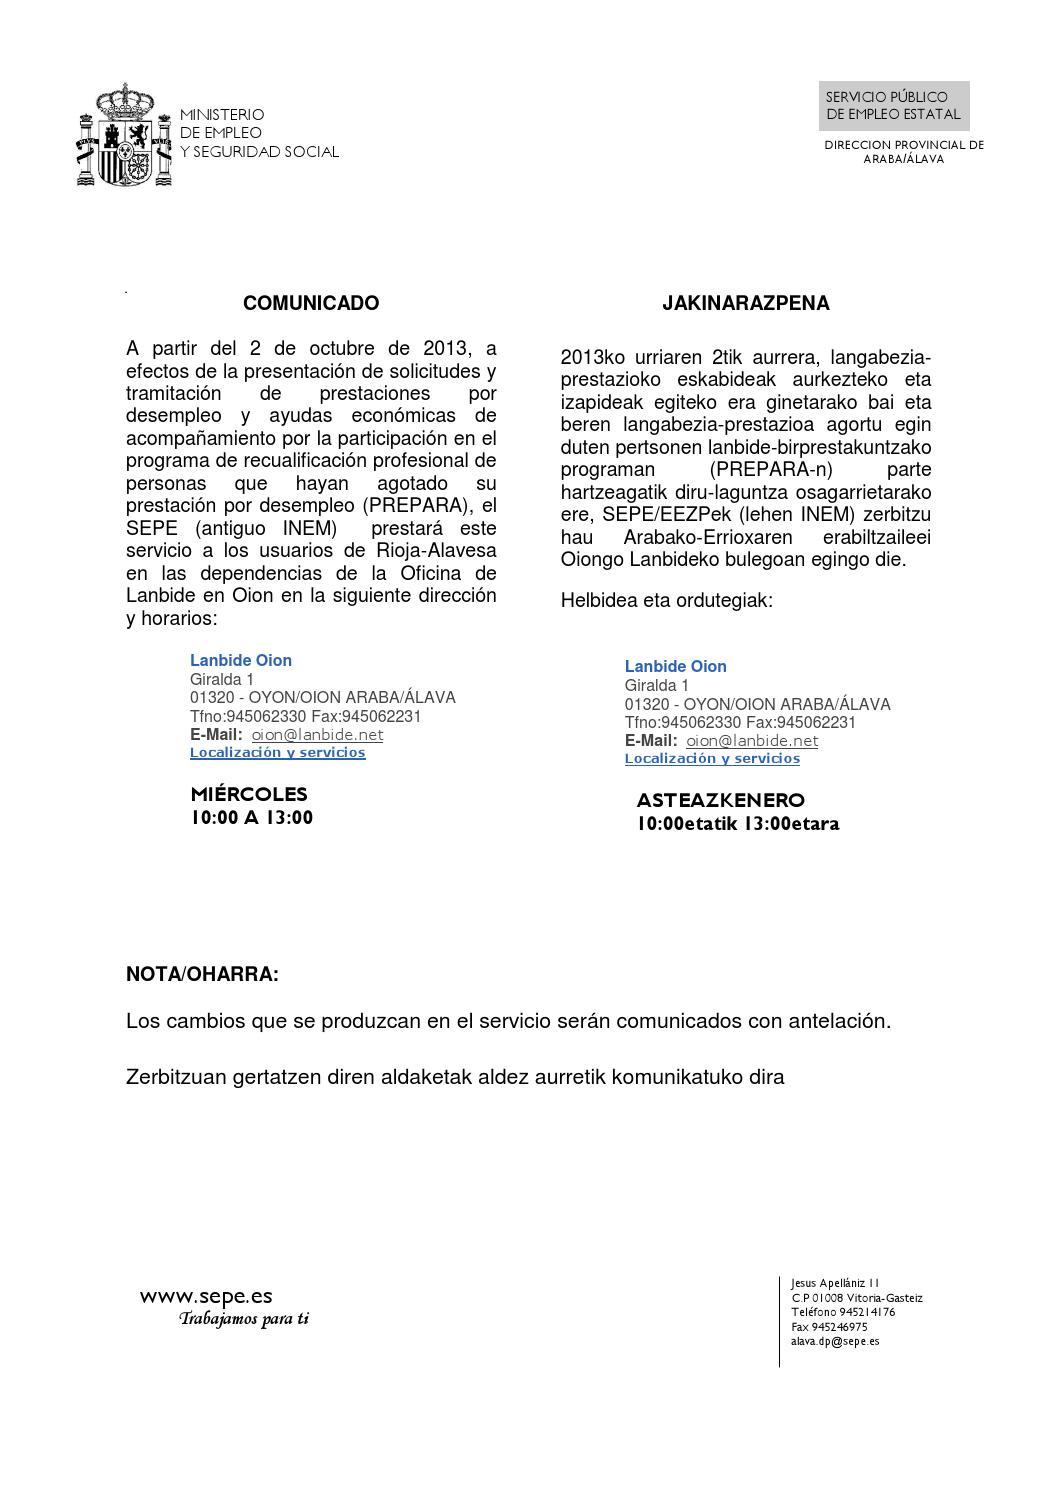 Comunicado sepe by cuadrilla rioja alavesa laguardia issuu for Inem horario oficinas